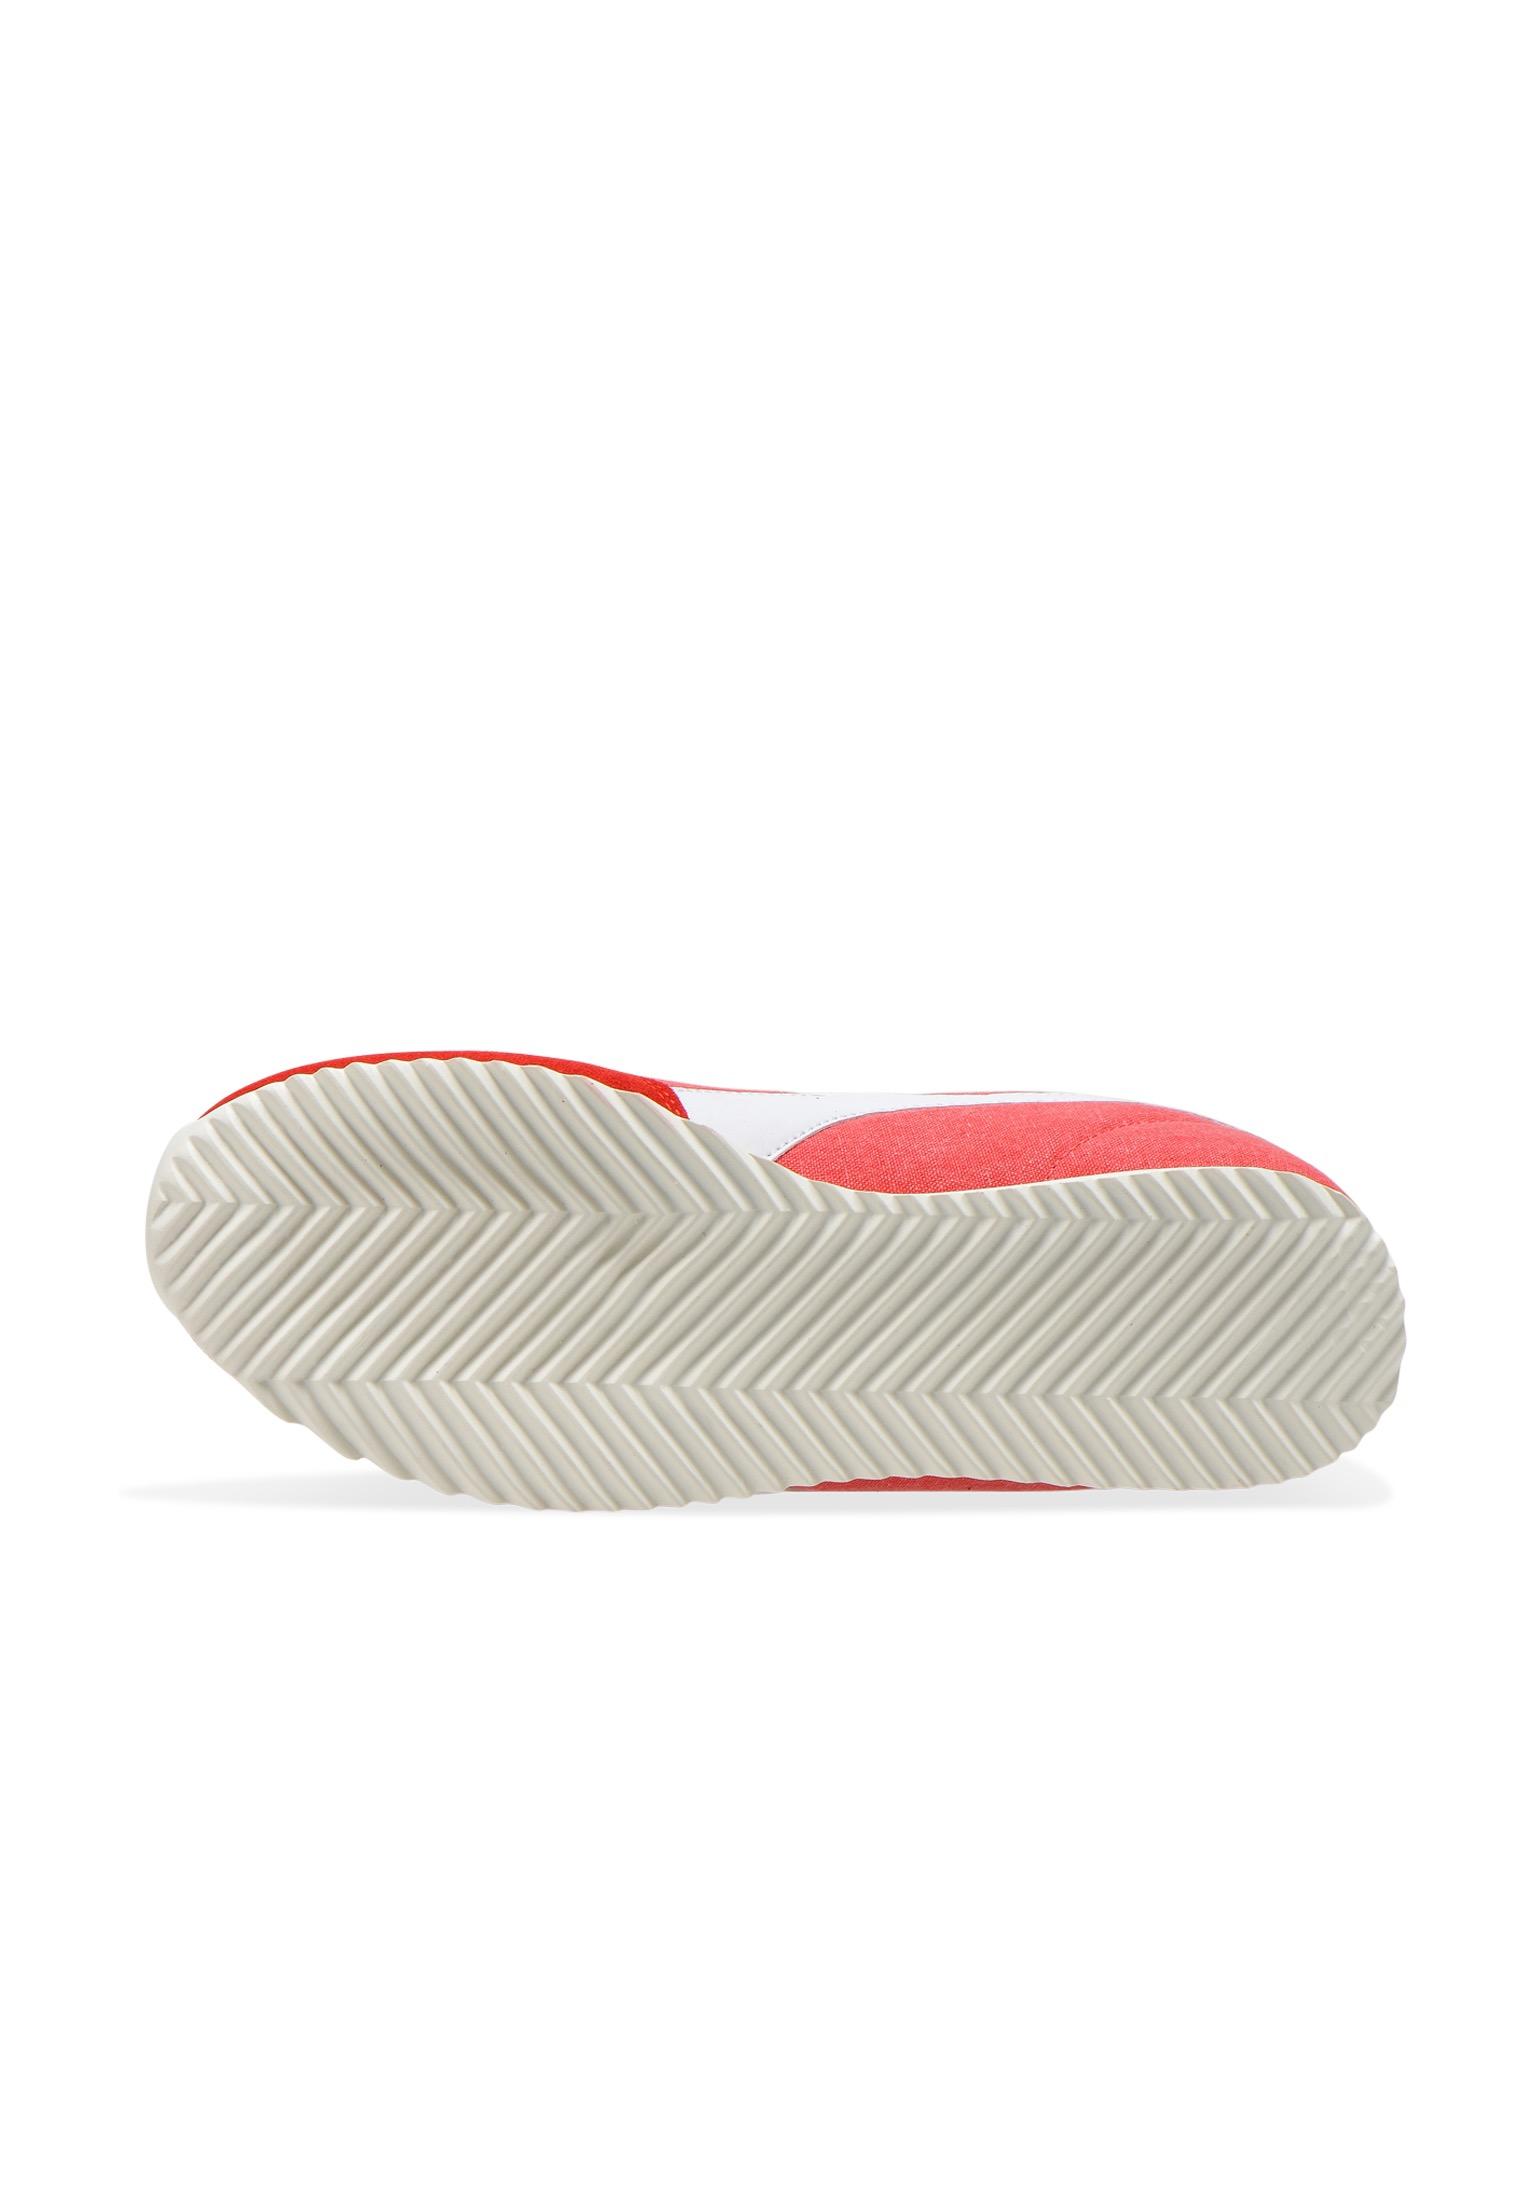 Scarpe-Diadora-Jog-Light-C-Sneakers-sportive-uomo-donna-vari-colori-e-taglie miniatura 88